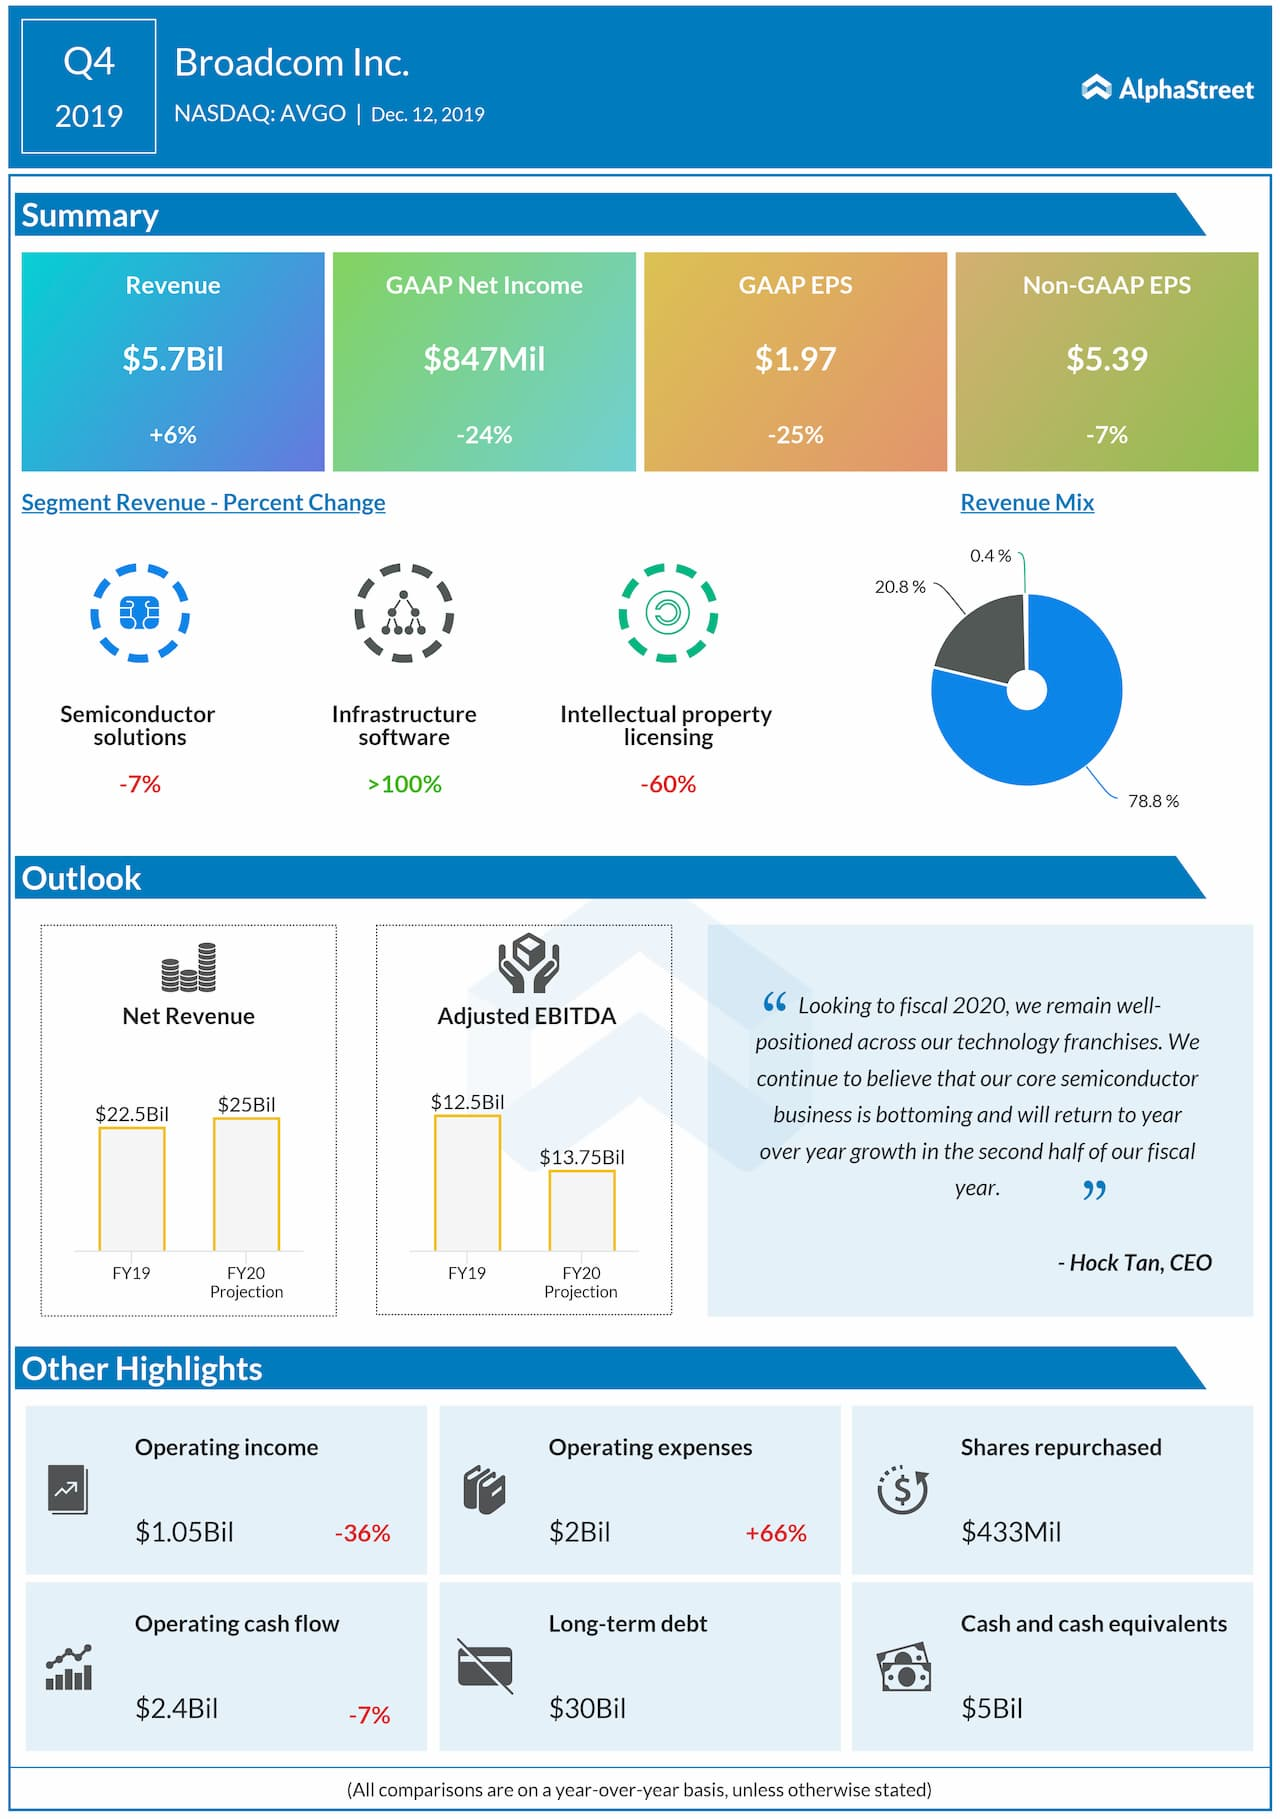 Broadcom beat revenue and earnings estimates in Q4 2019